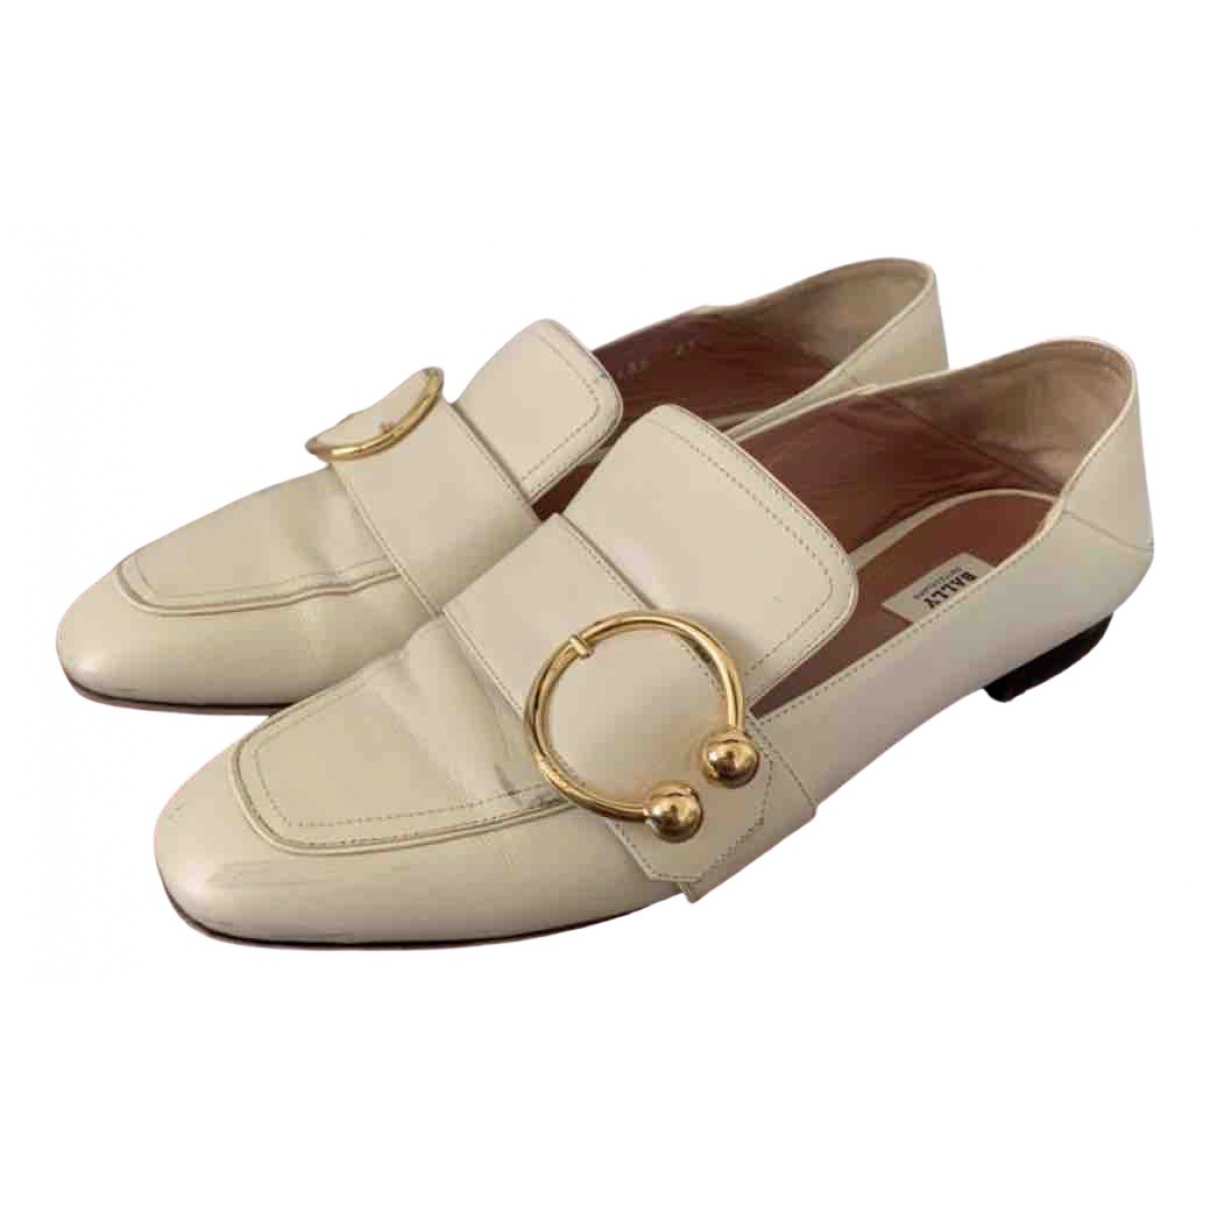 Bally \N White Leather Flats for Women 39.5 EU